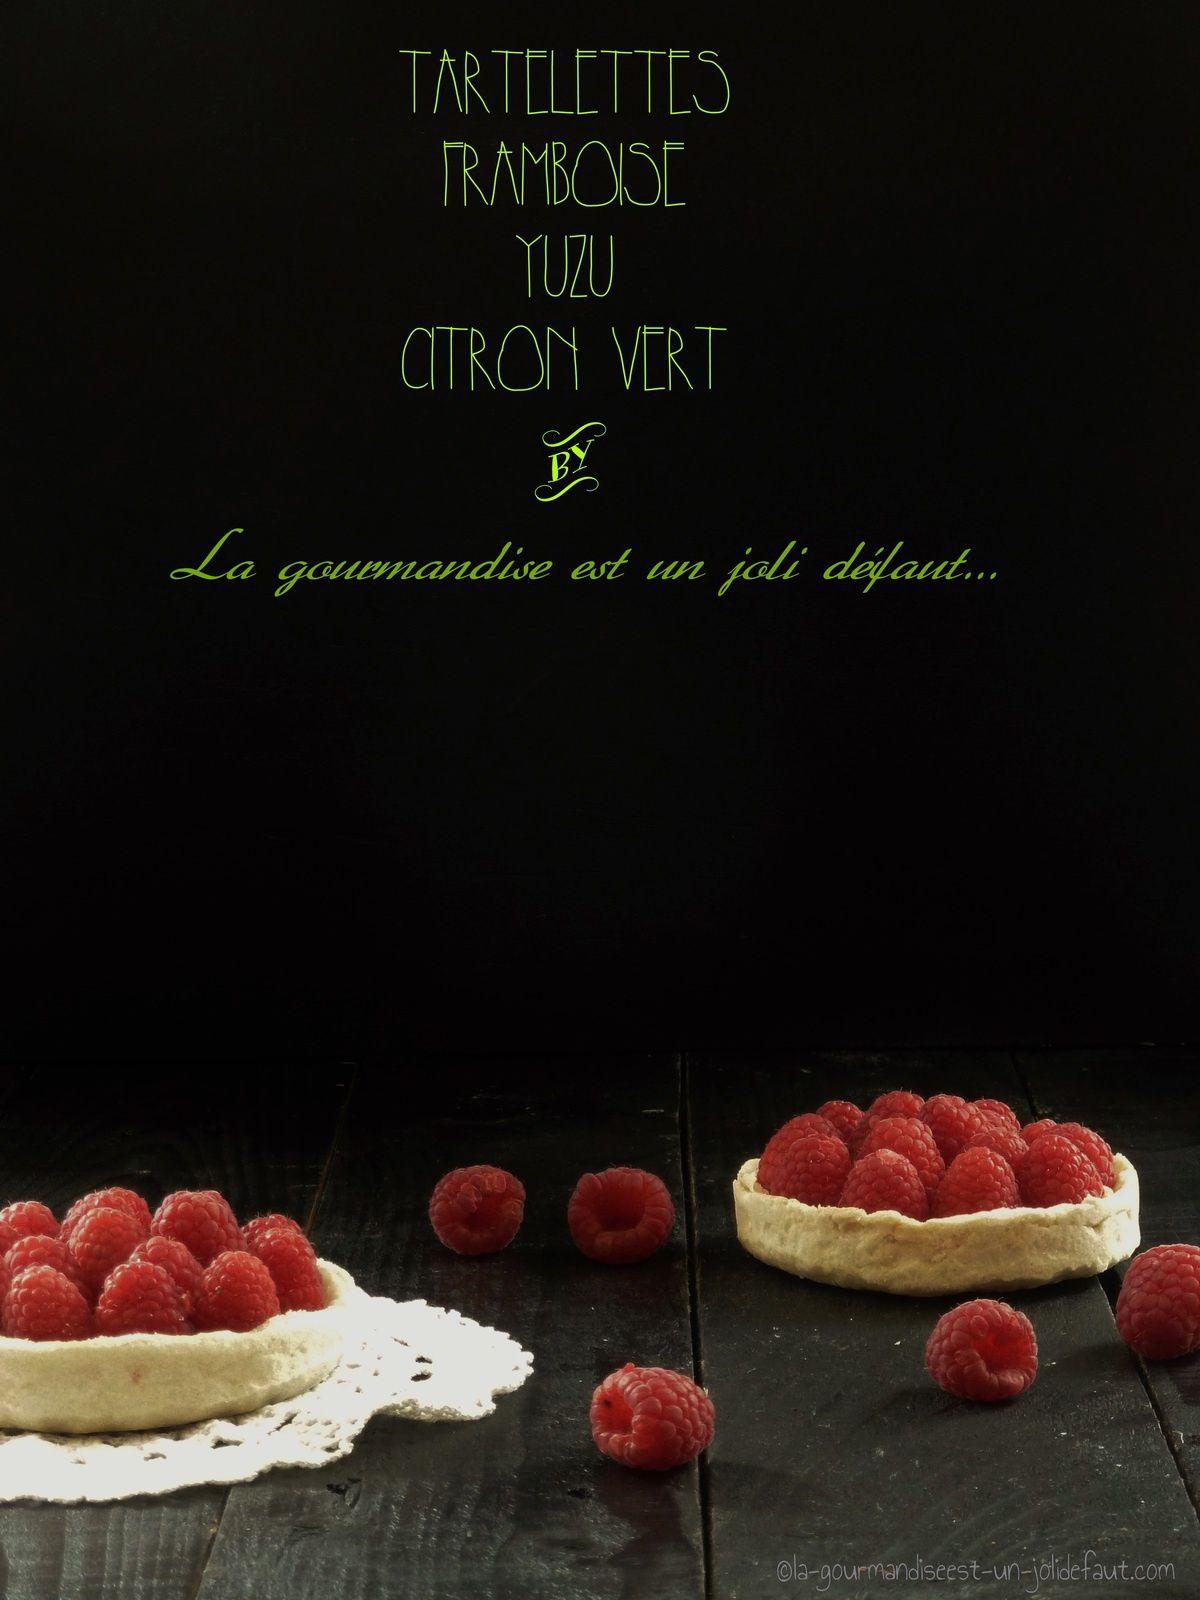 Tartelettes aux framboises, citron vert et yuzu